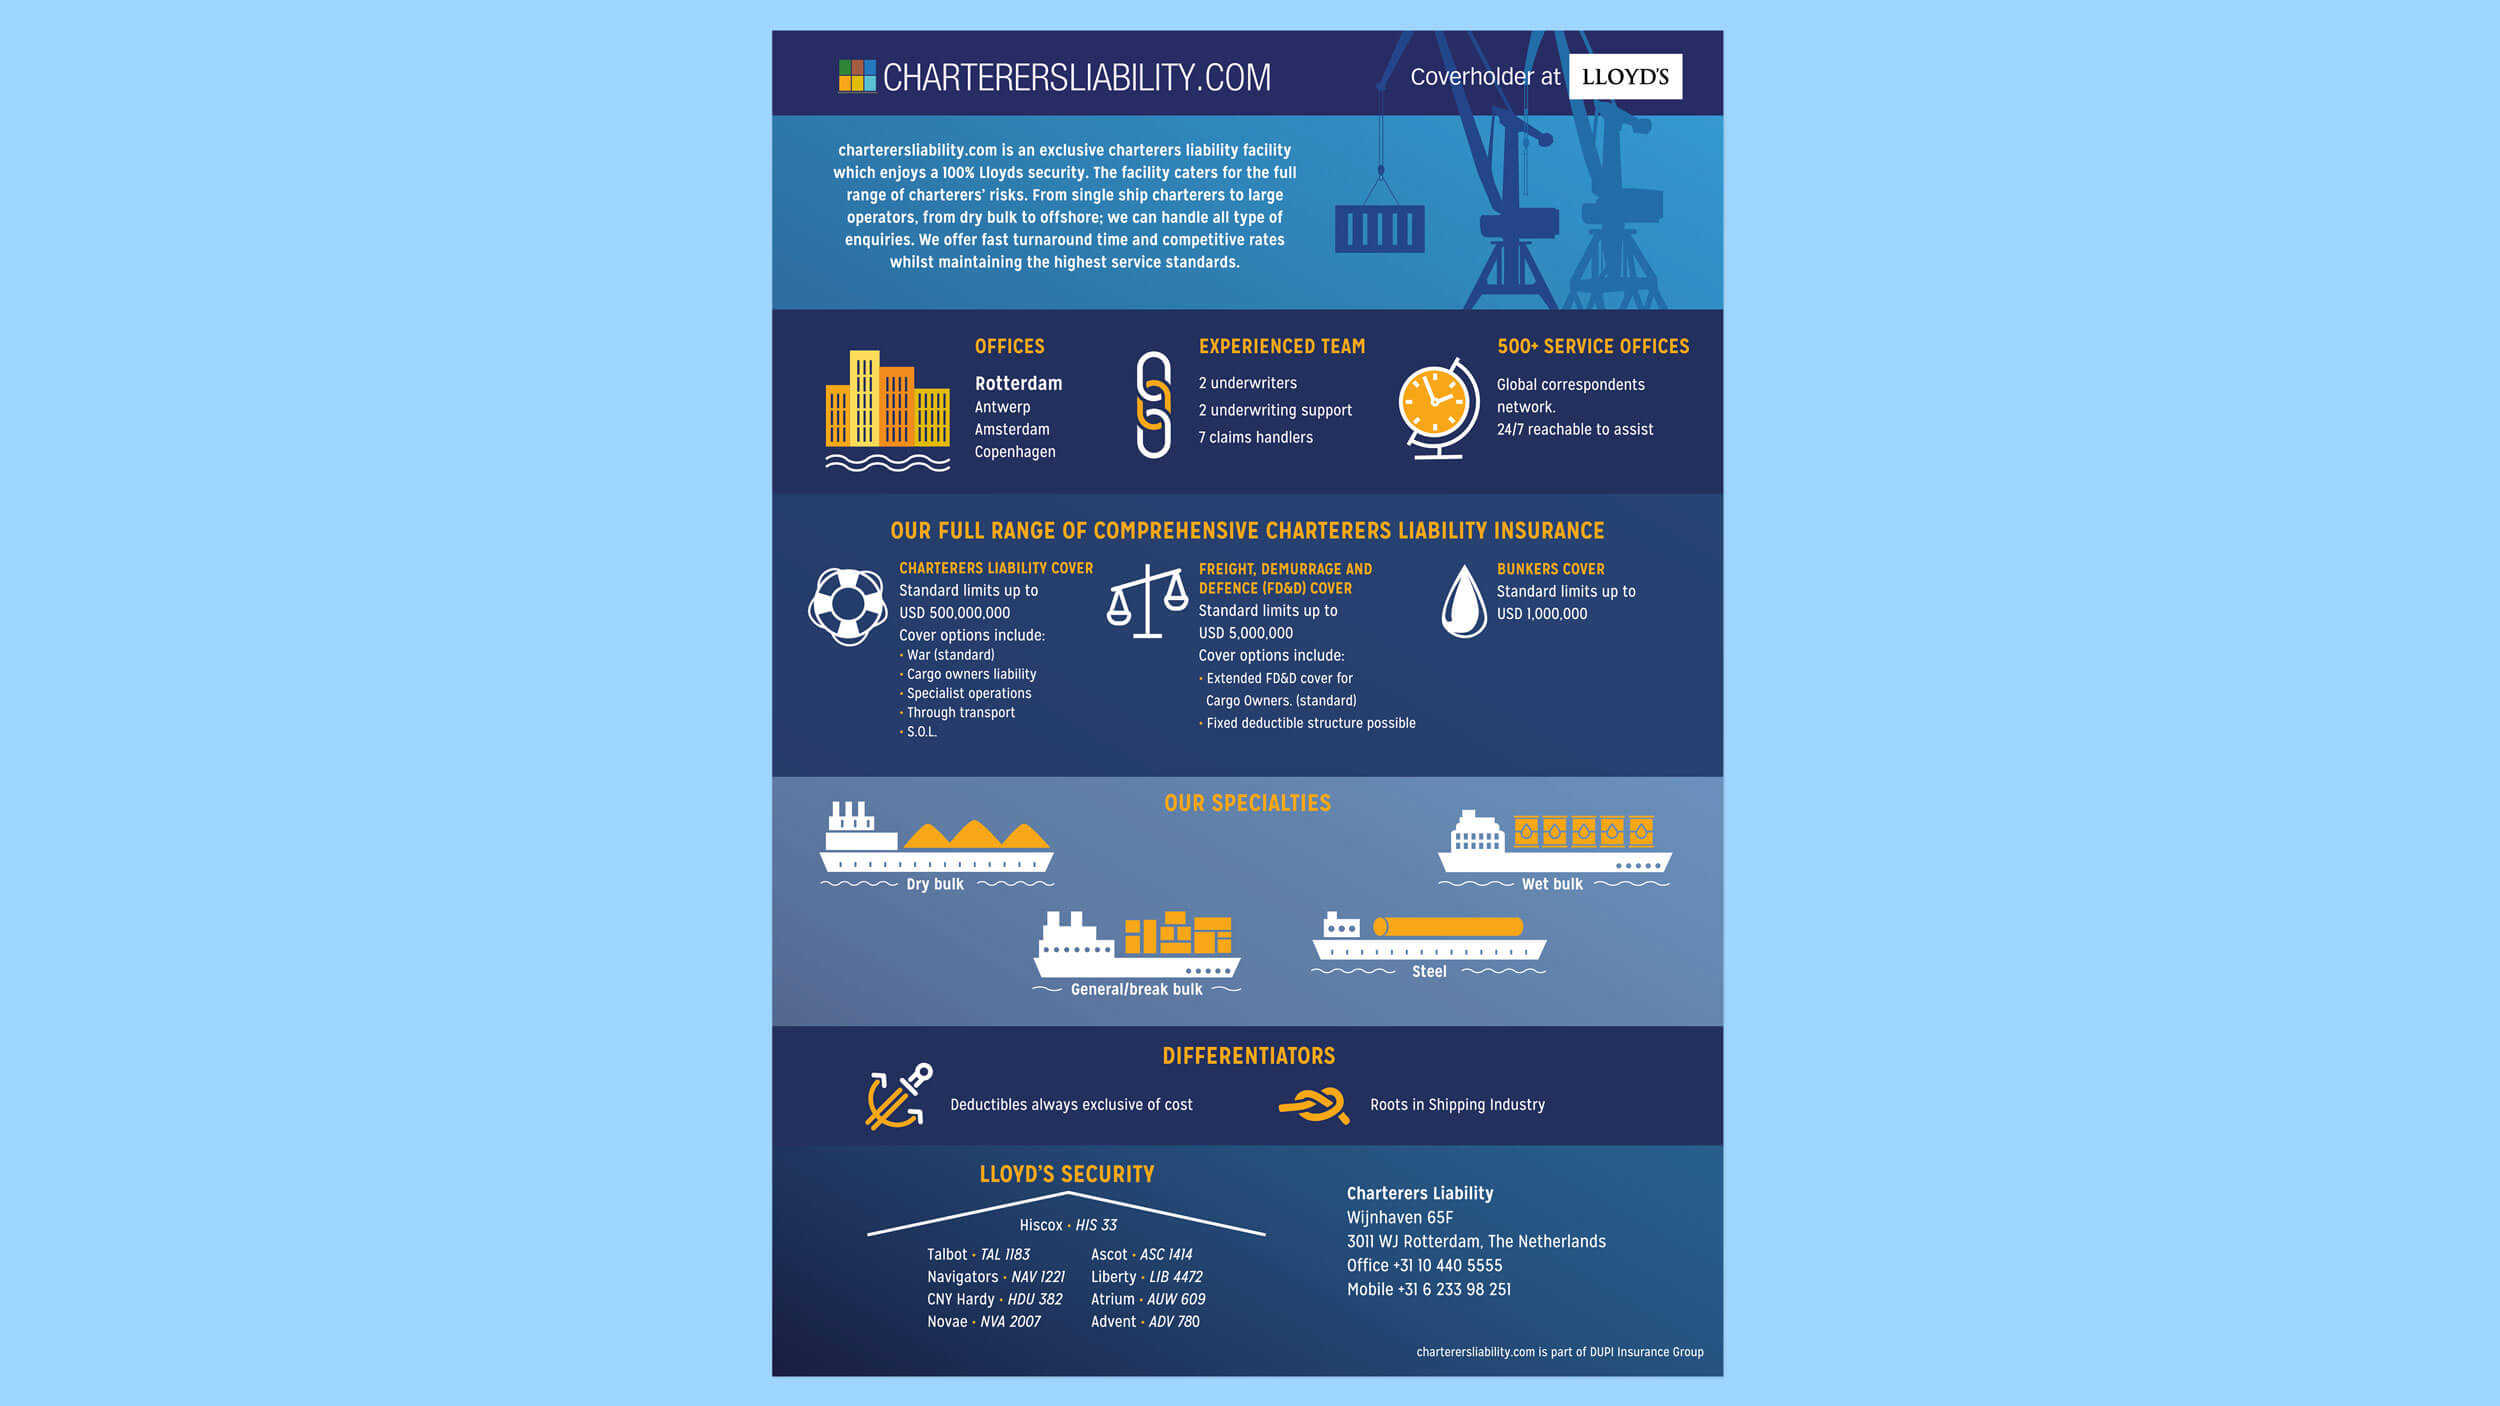 charterersliability.com, infographic, Mixus studio